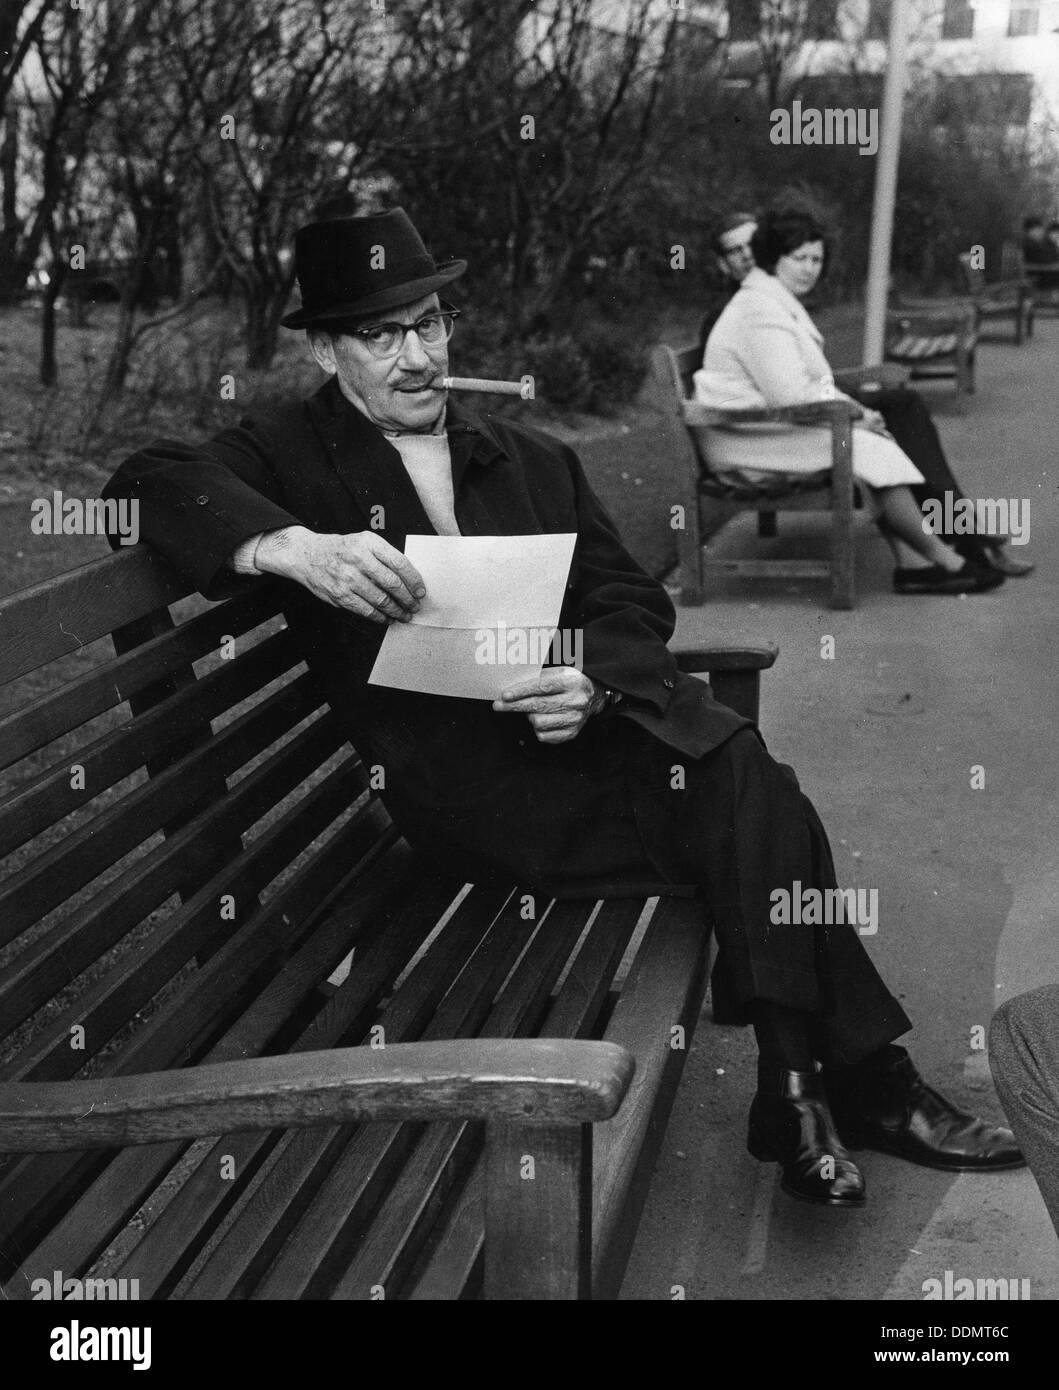 Groucho Marx (1890-1977), American comedian, 1965. - Stock Image